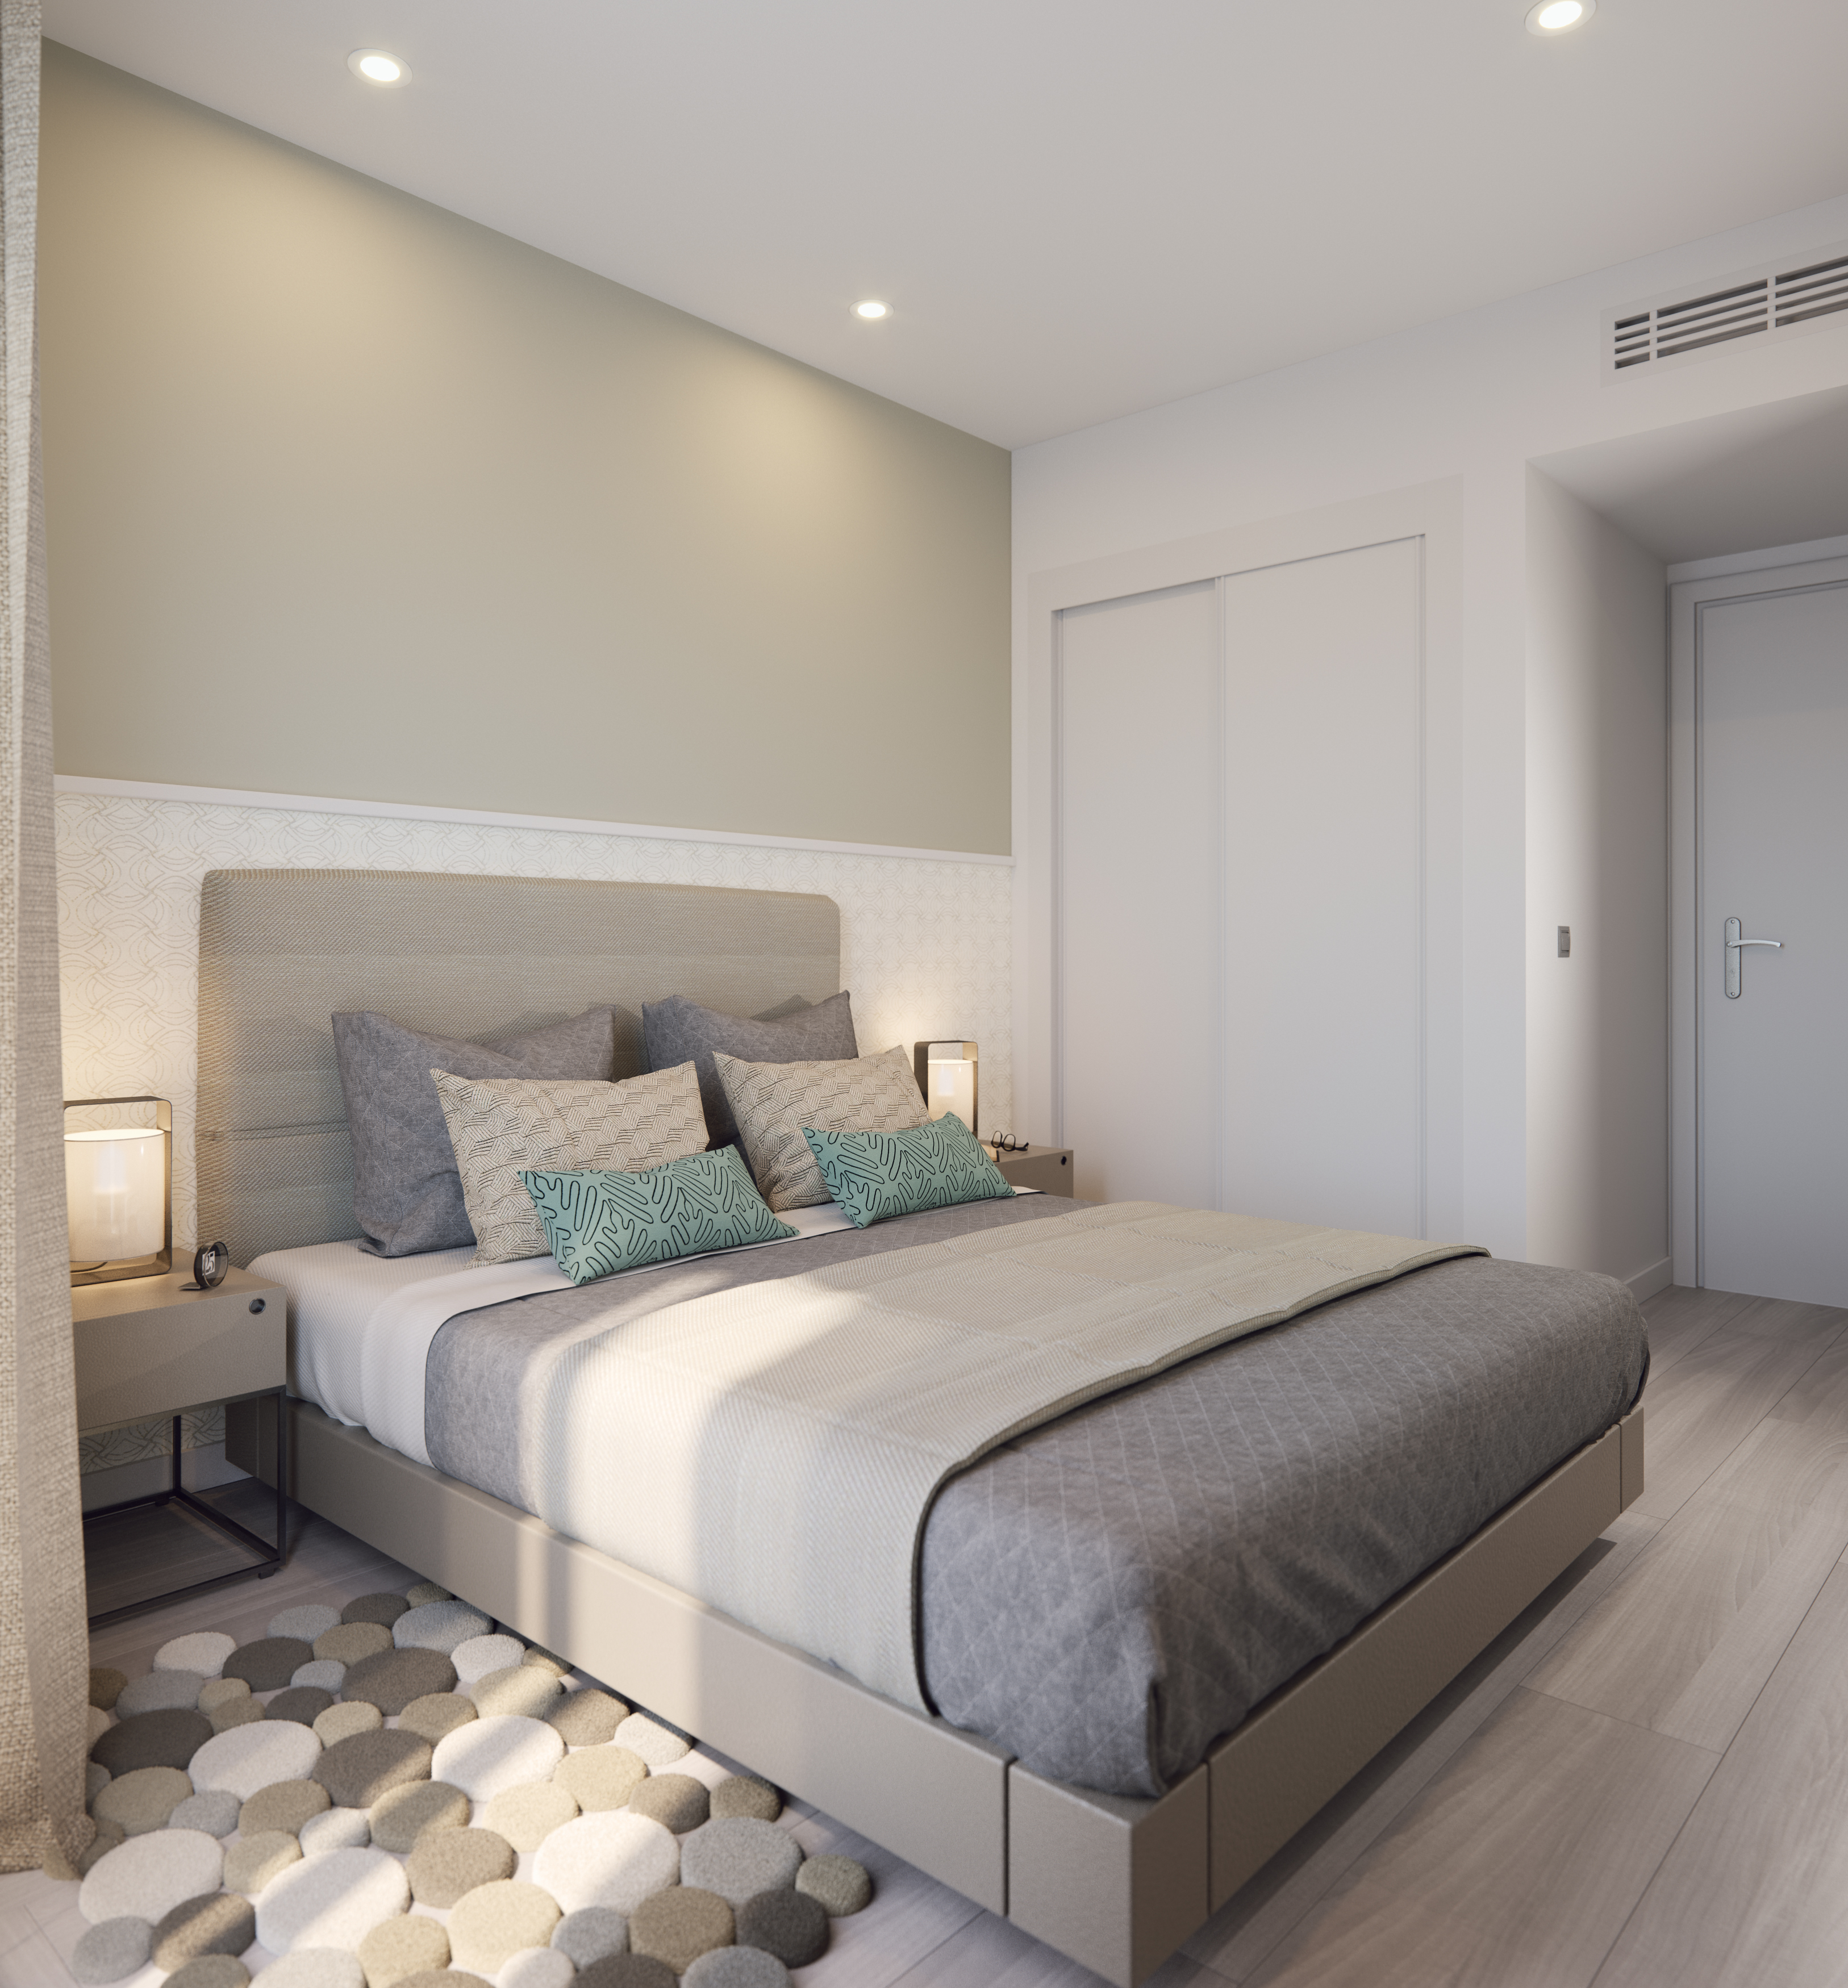 2 bedroom apartment For Sale in Roldan - photograph 7